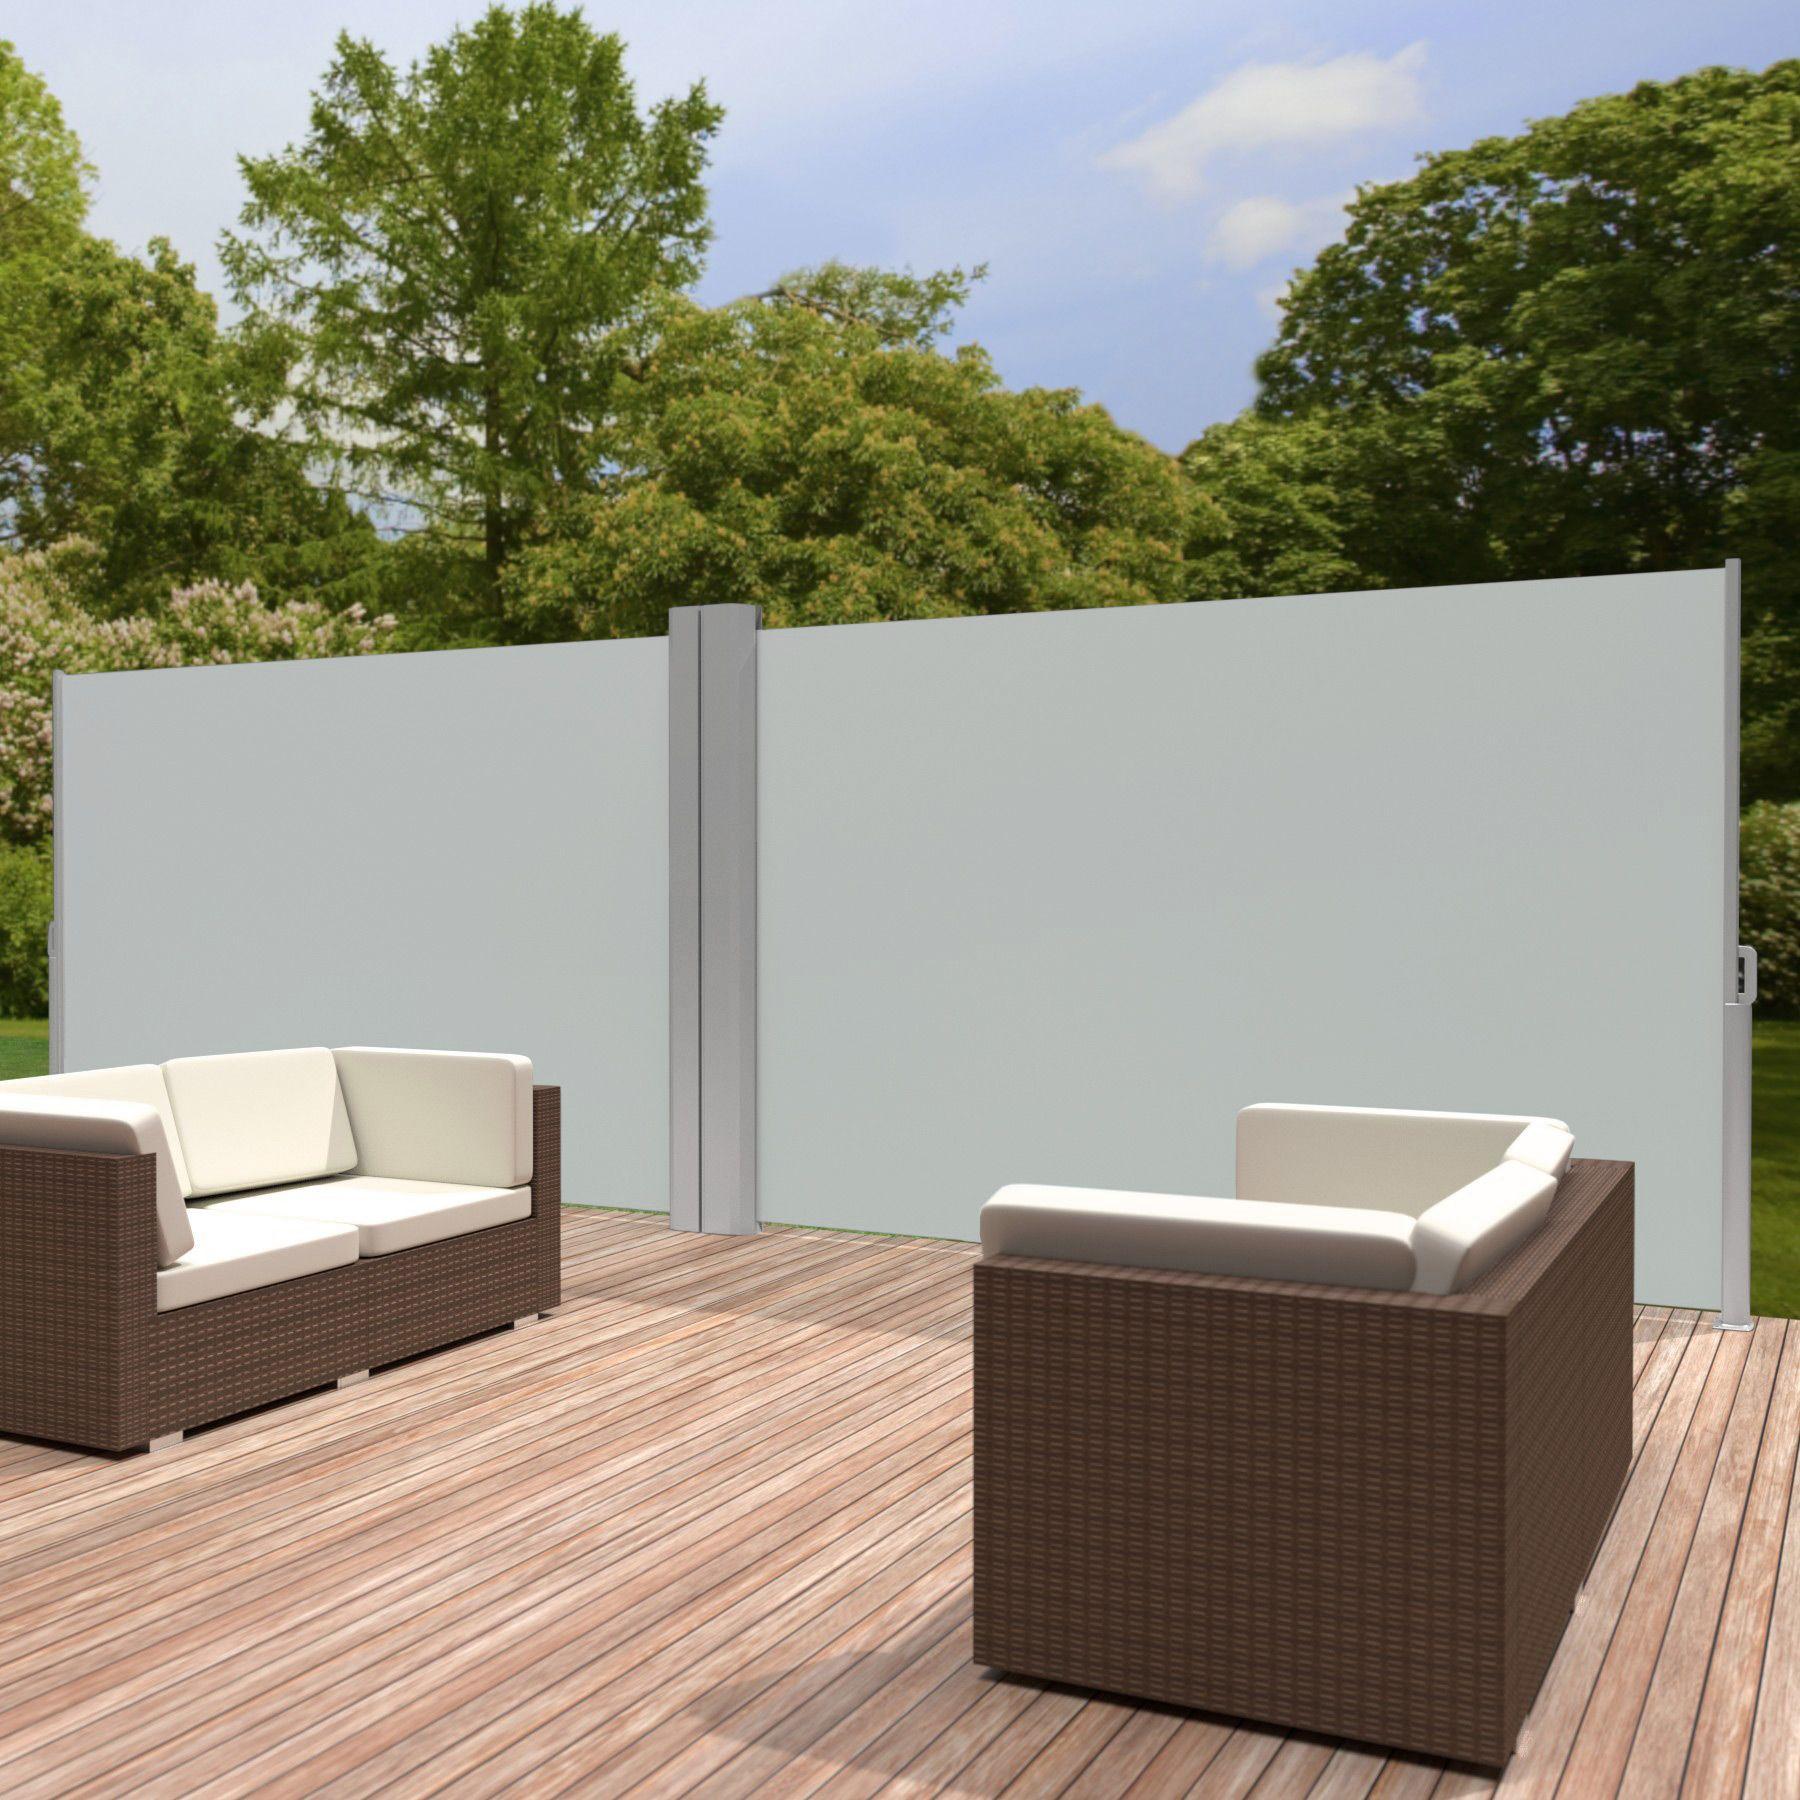 store lat ral double brise vue abri soleil aluminium auvent r tractable terrasse ebay. Black Bedroom Furniture Sets. Home Design Ideas